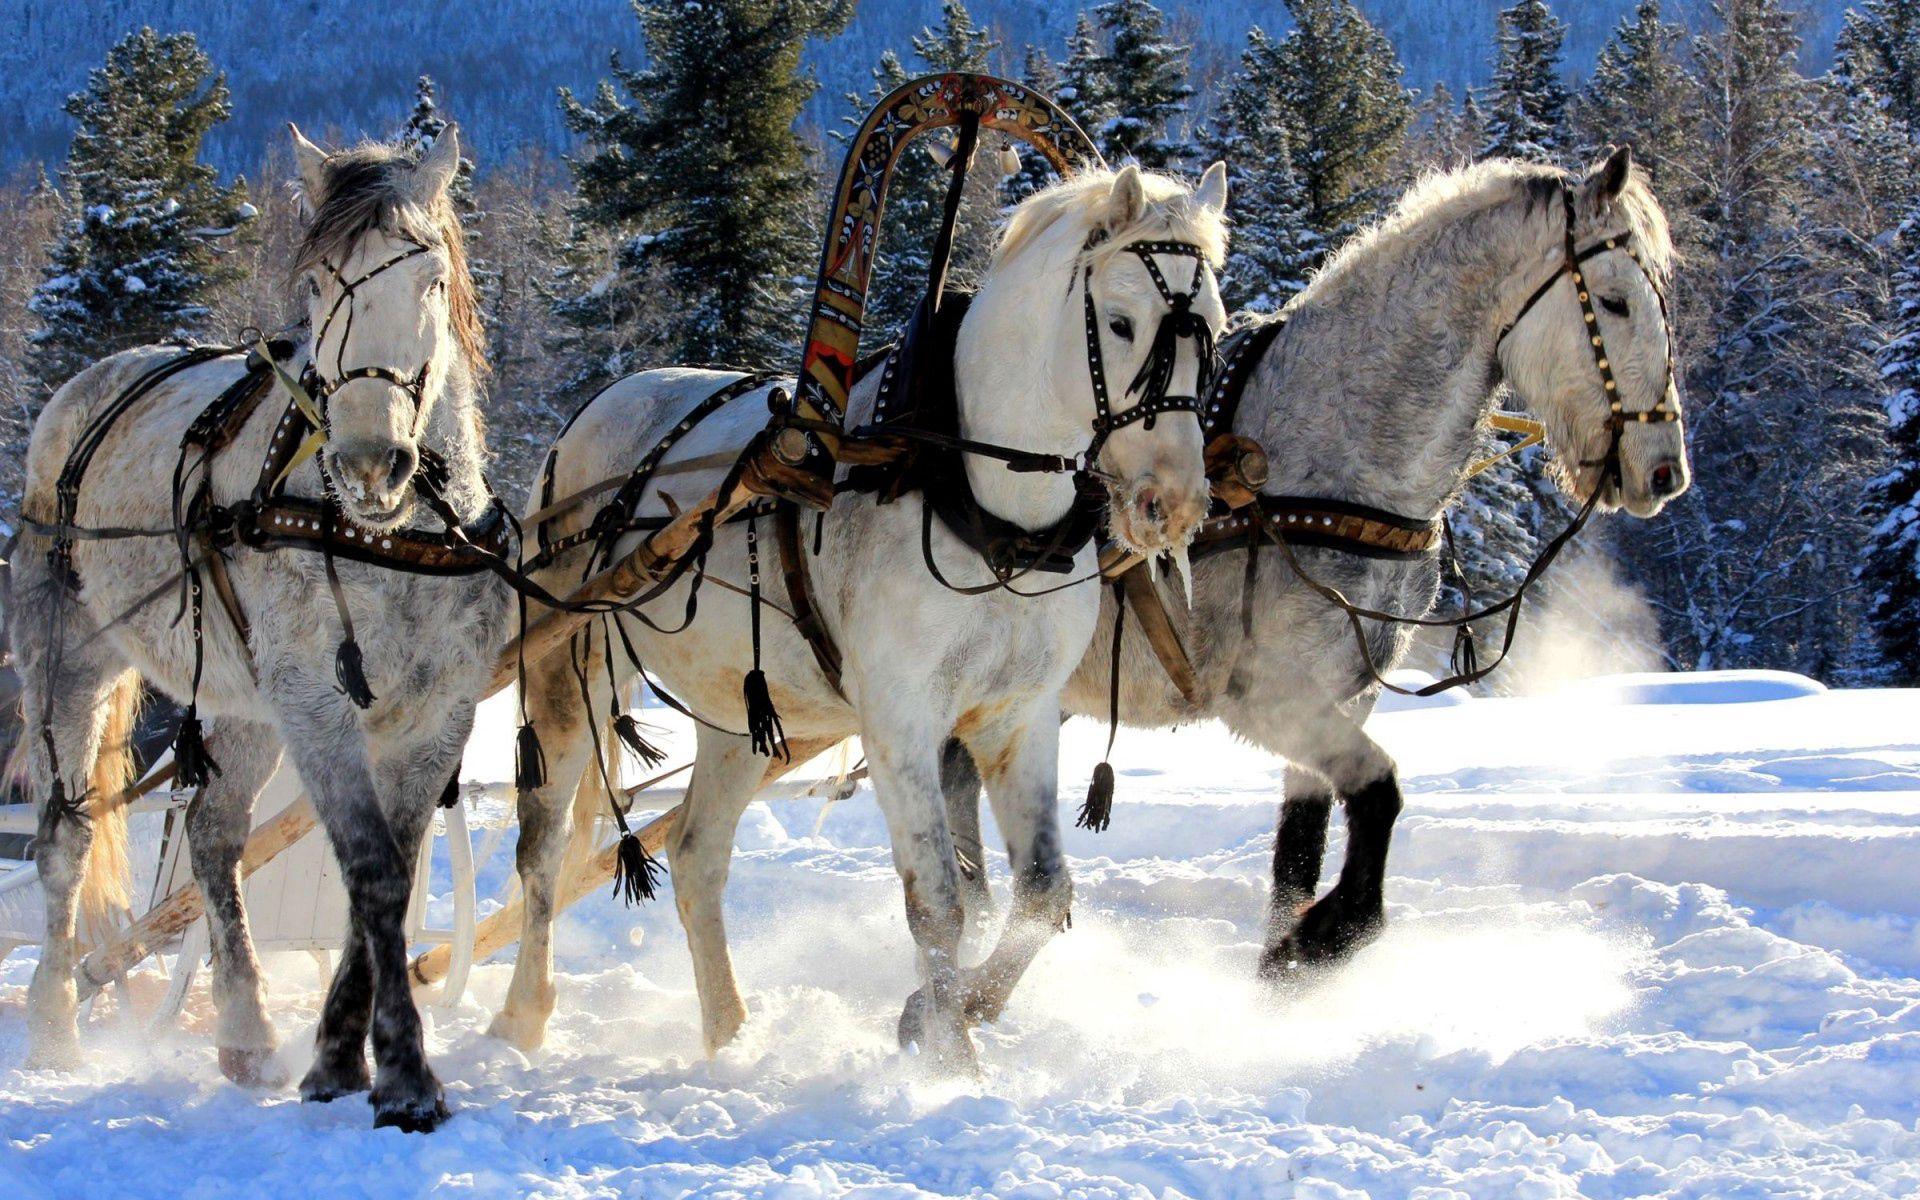 74362 descargar fondo de pantalla Animales, Caballos, Tres, Equipo, Nieve, Trineo: protectores de pantalla e imágenes gratis